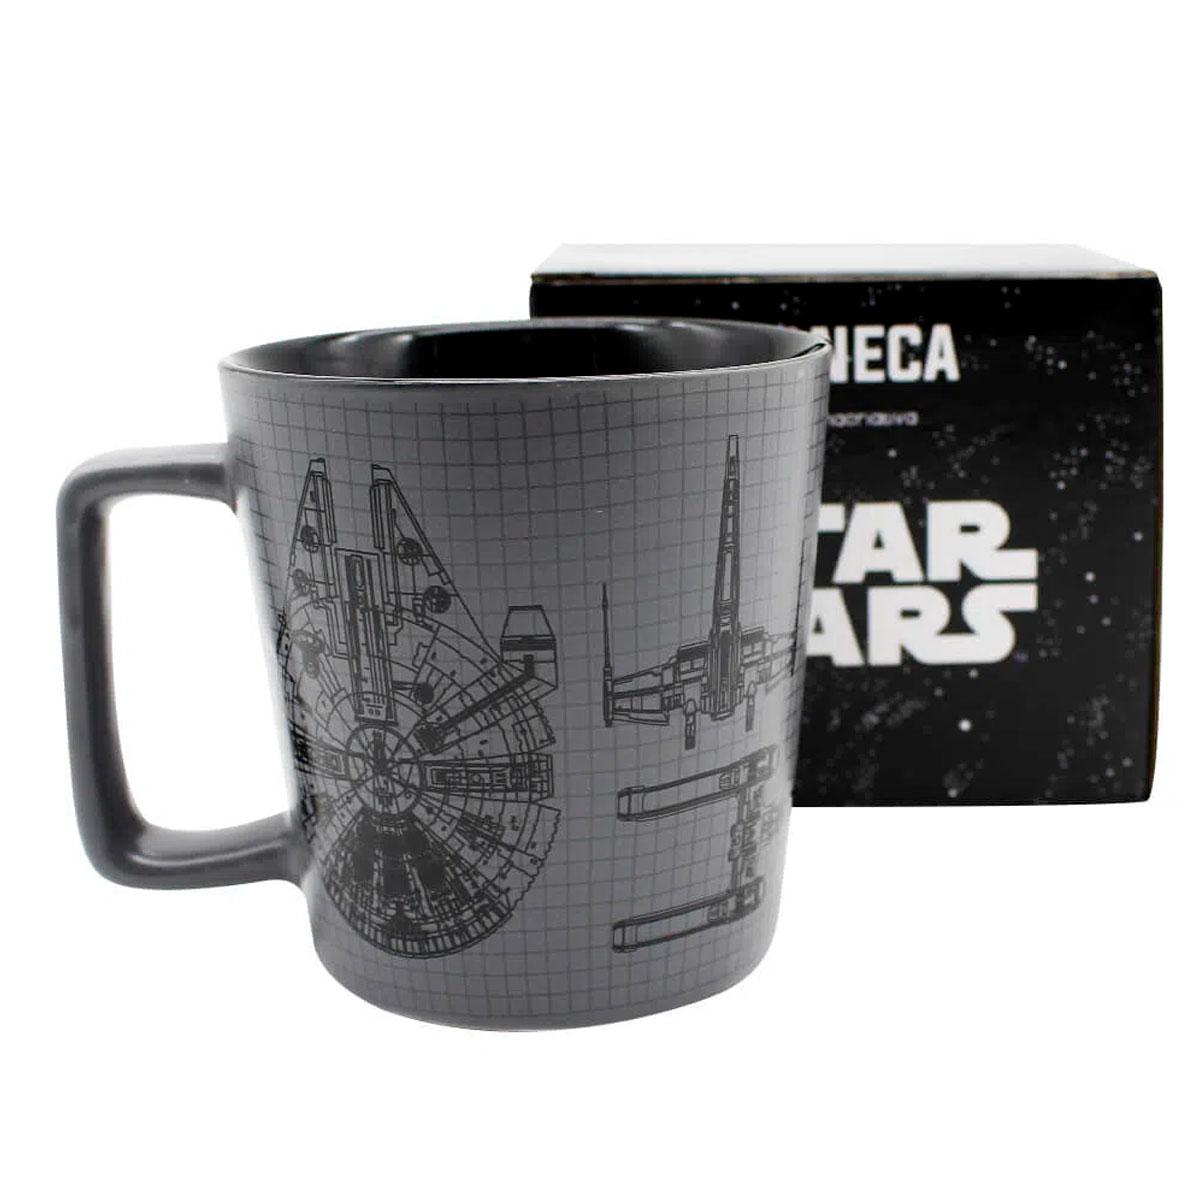 Caneca Alça Quadrada 400 ml Millenium Falcon Star Wars - Presente Super